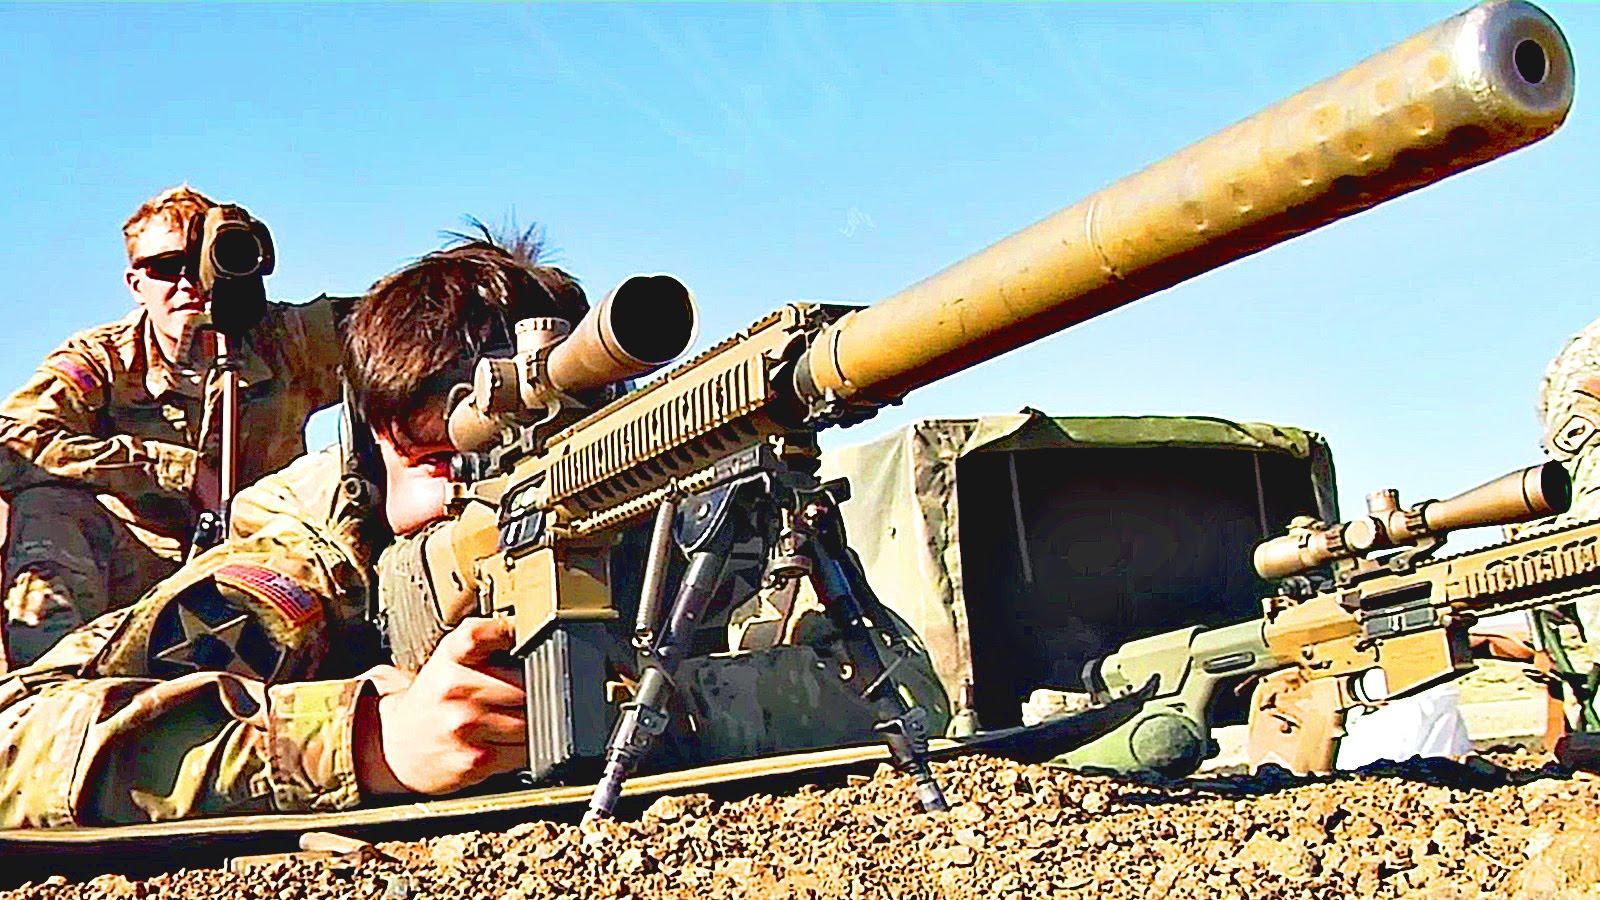 U.S. Army Sniper Rifle Range – M110 SASS